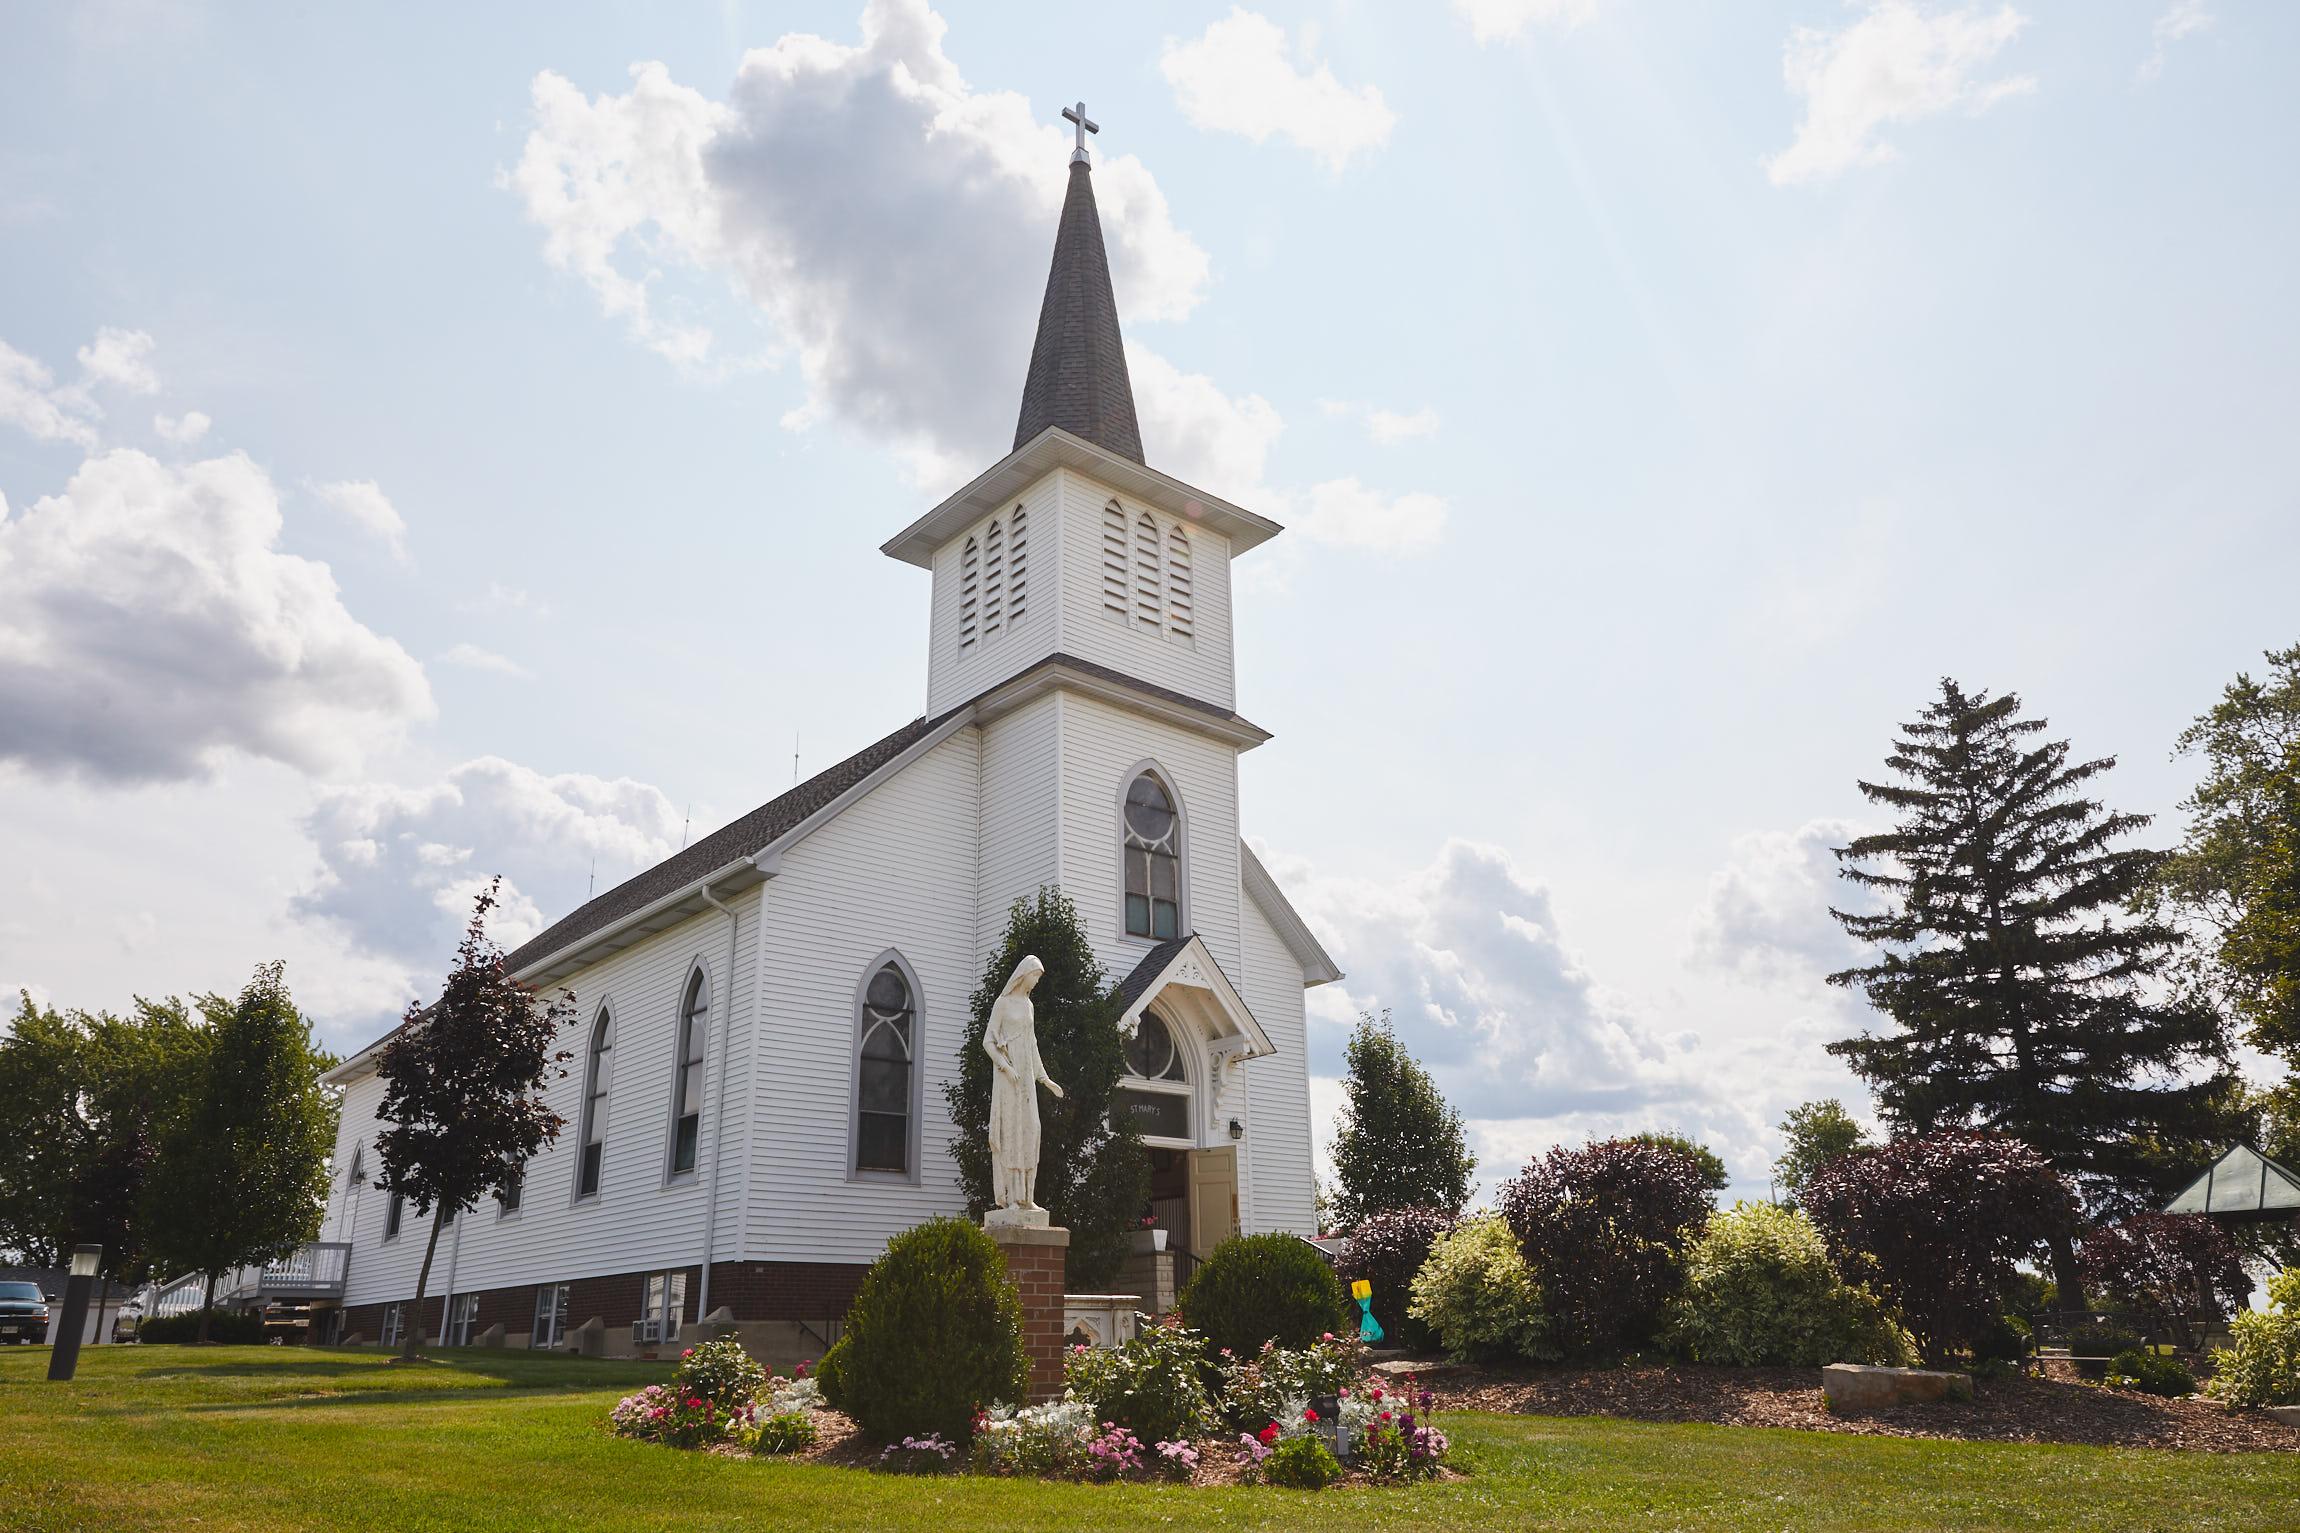 St. Mary's of Annunciation Little Church